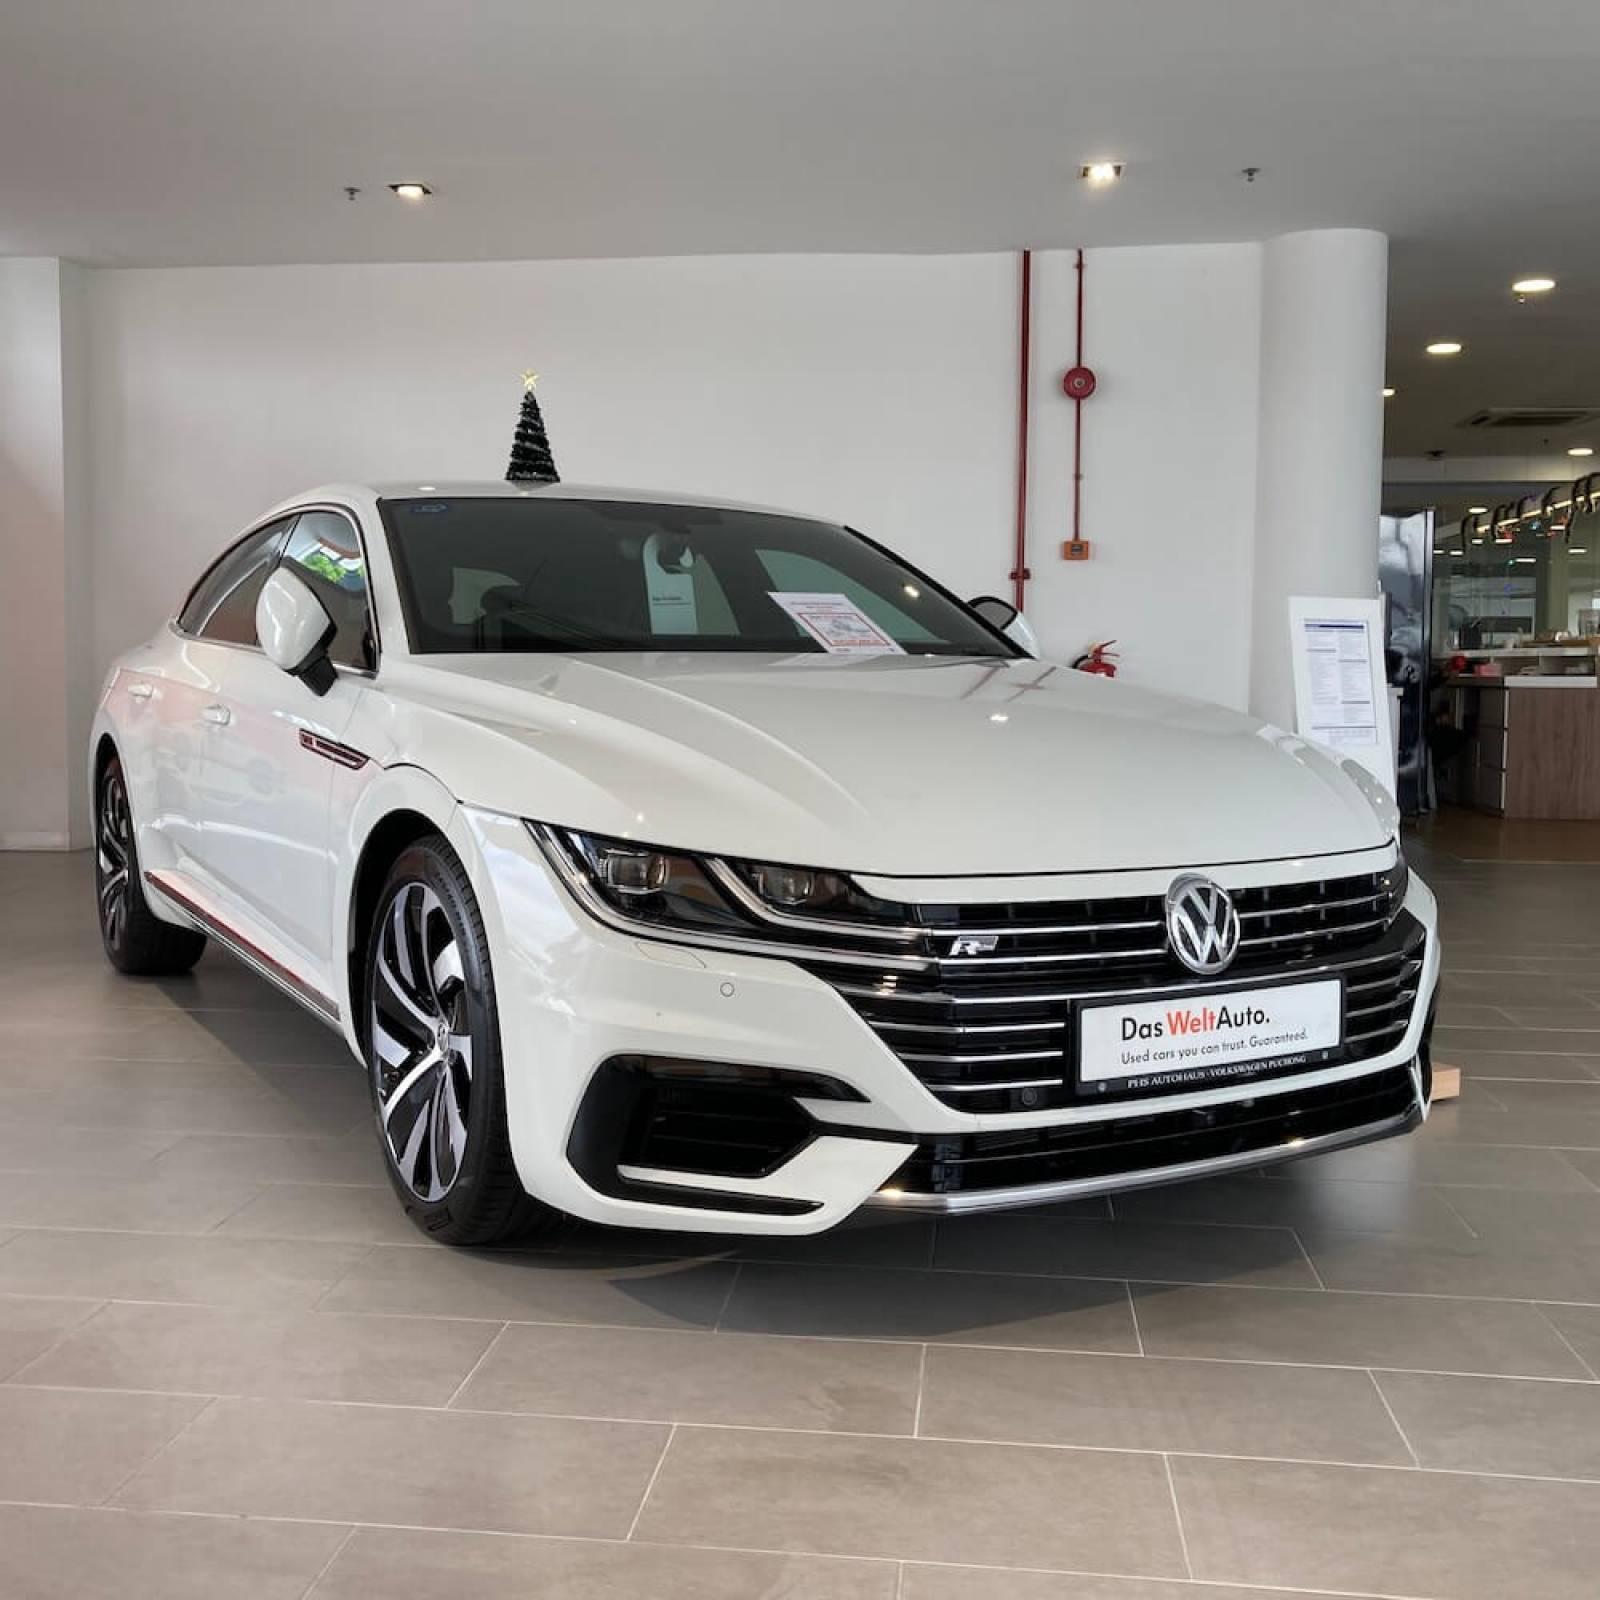 2019 Volkswagen Arteon R-Line 4motion (CBU)